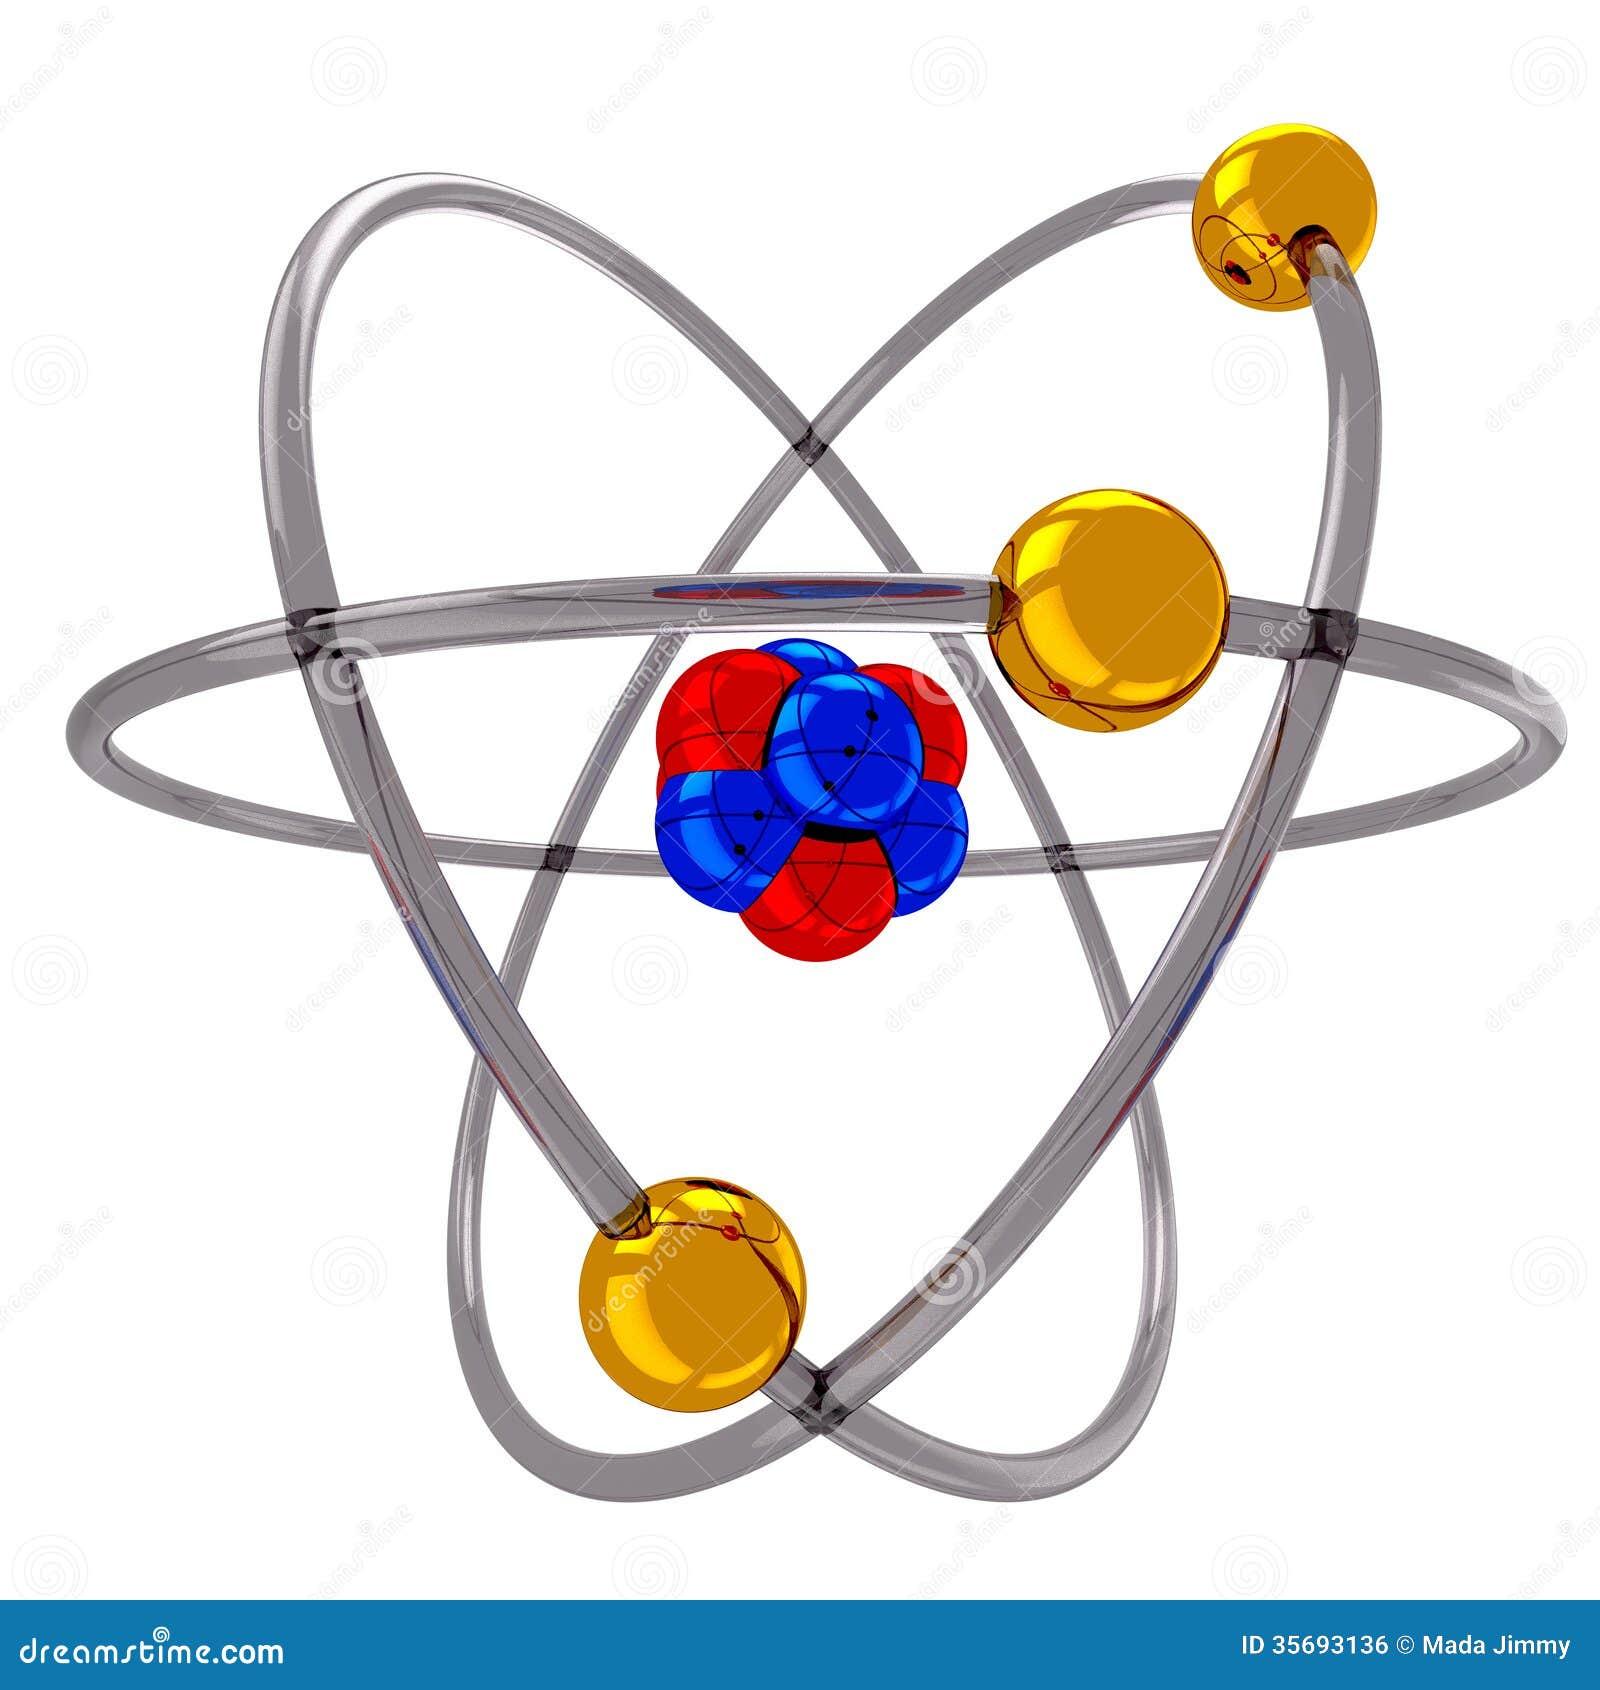 Atom Model Science Technology